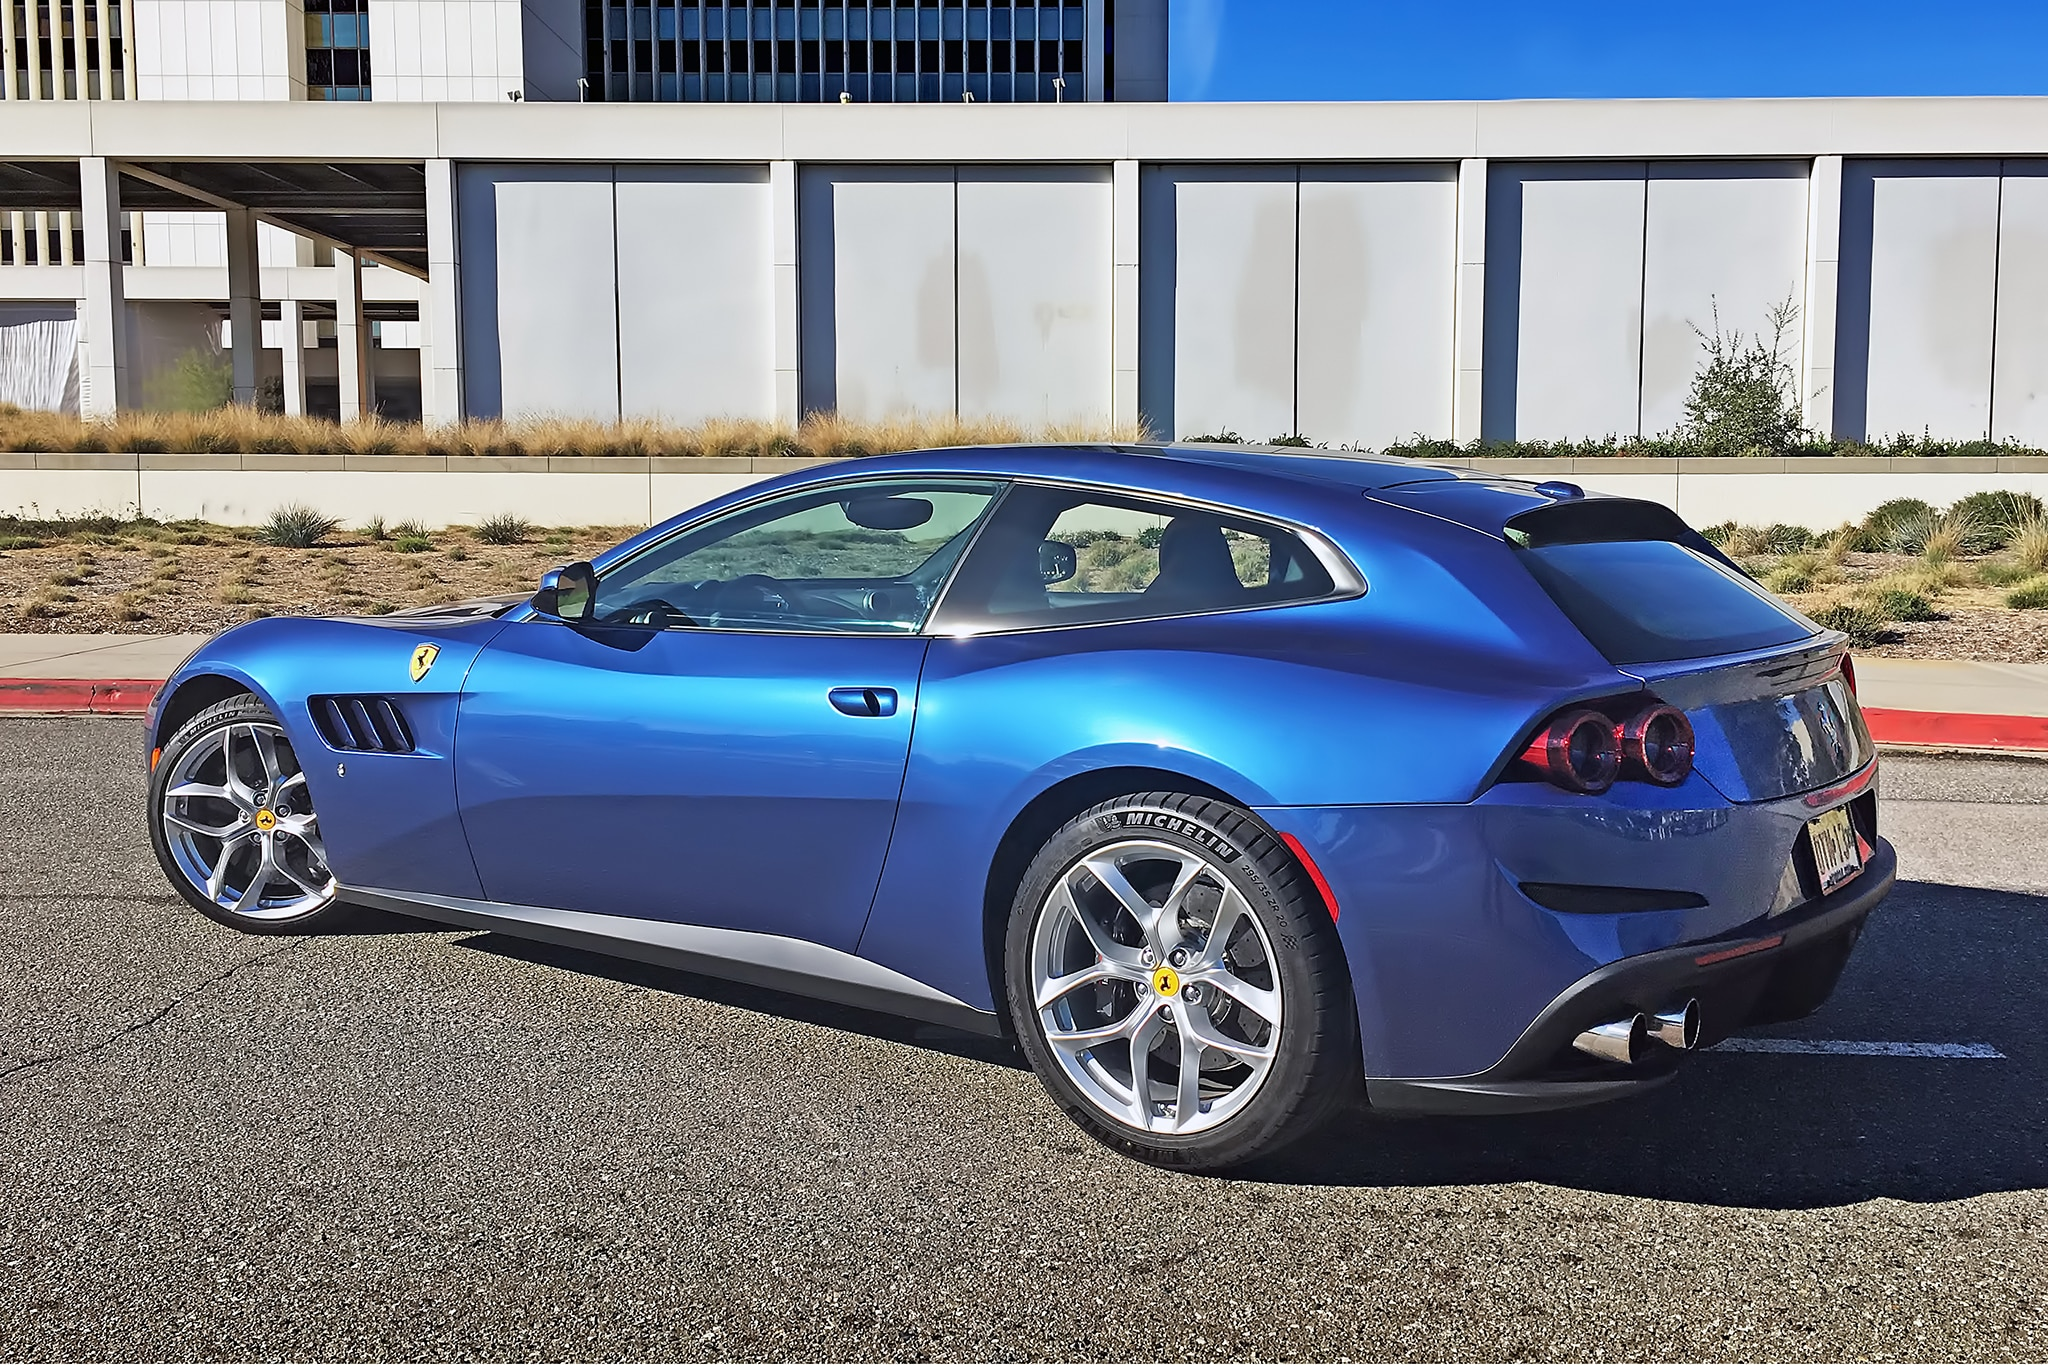 One Week With: 2018 Ferrari GTC4Lusso T